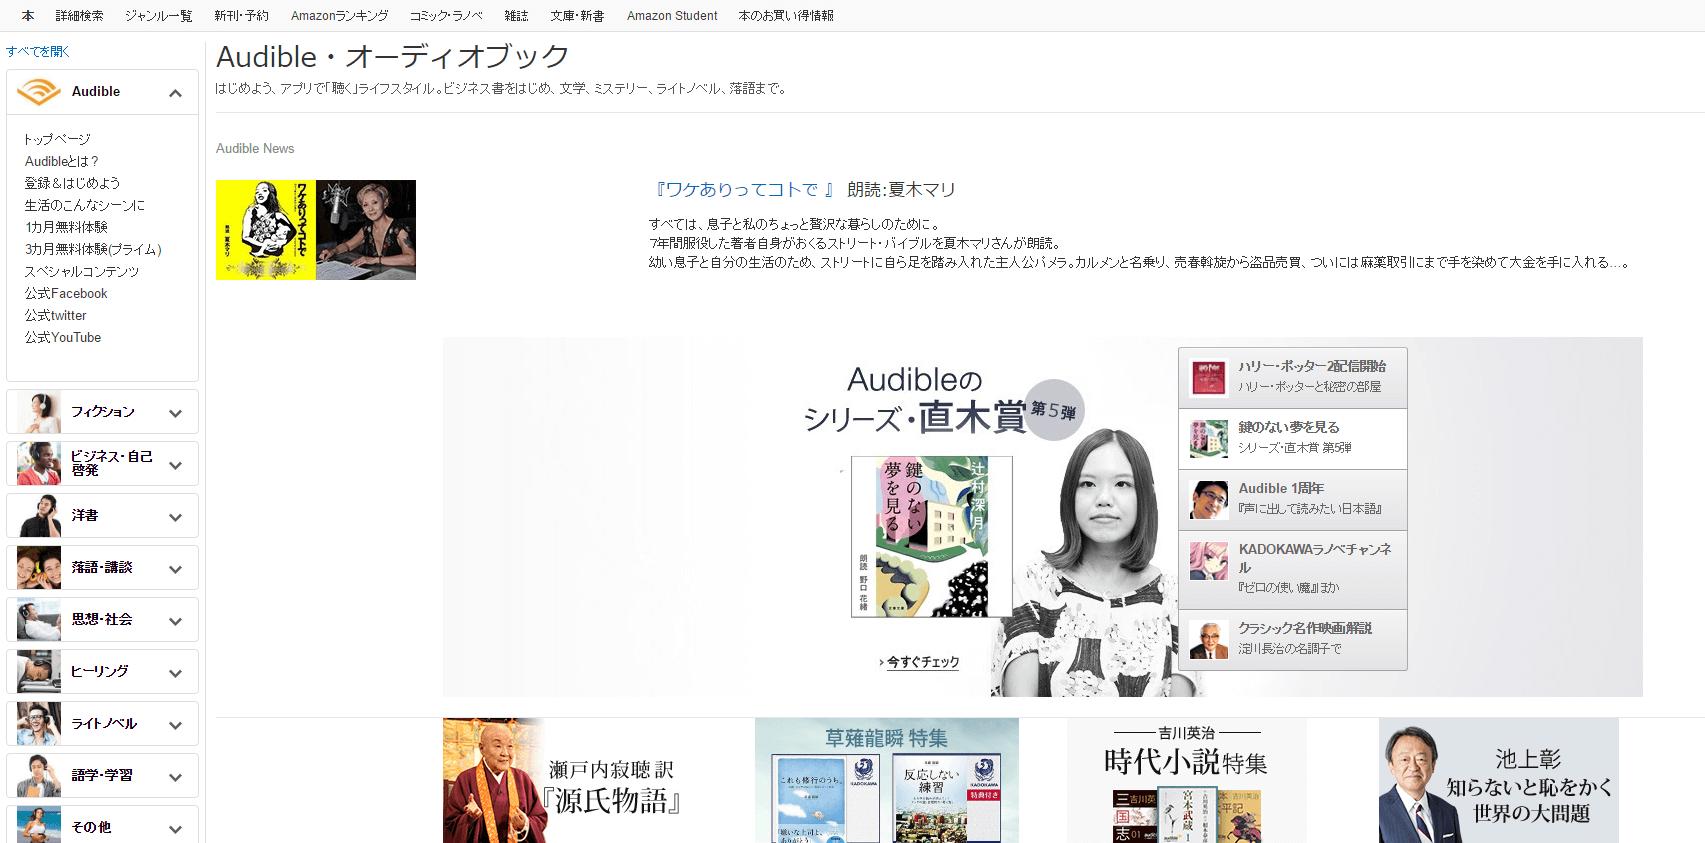 「Audible」サイト